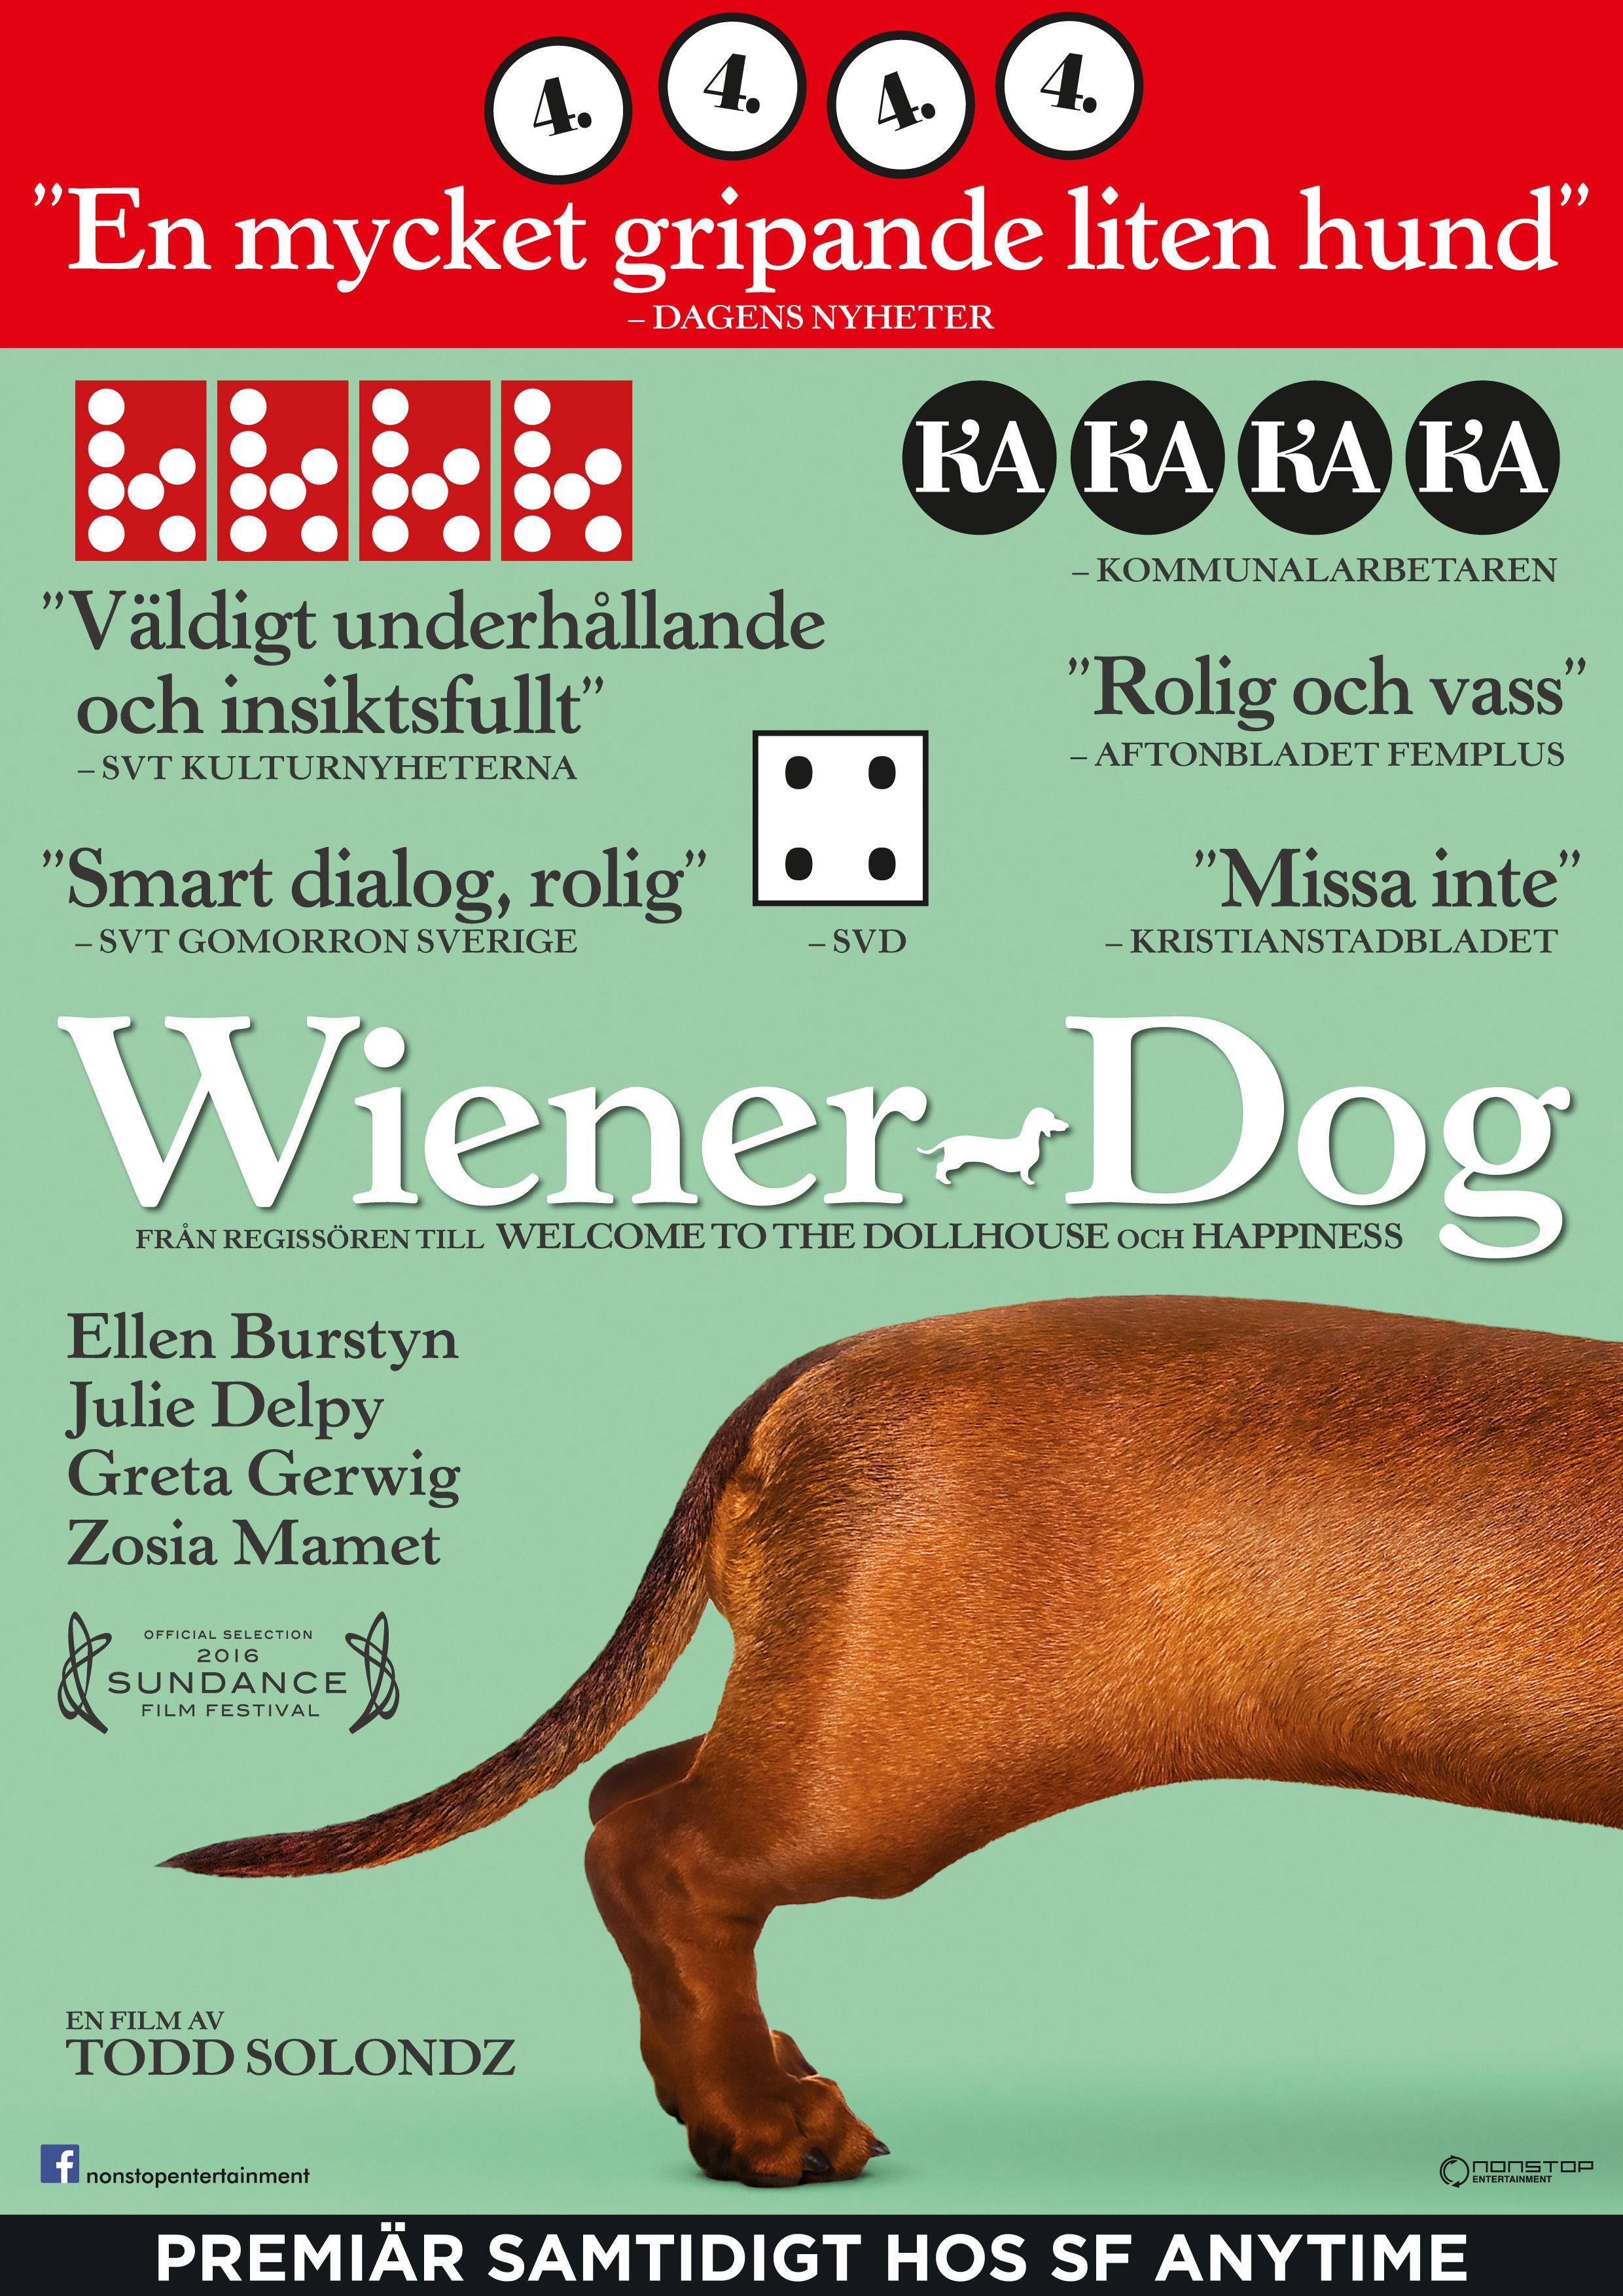 Wiener-dog poster.jpg